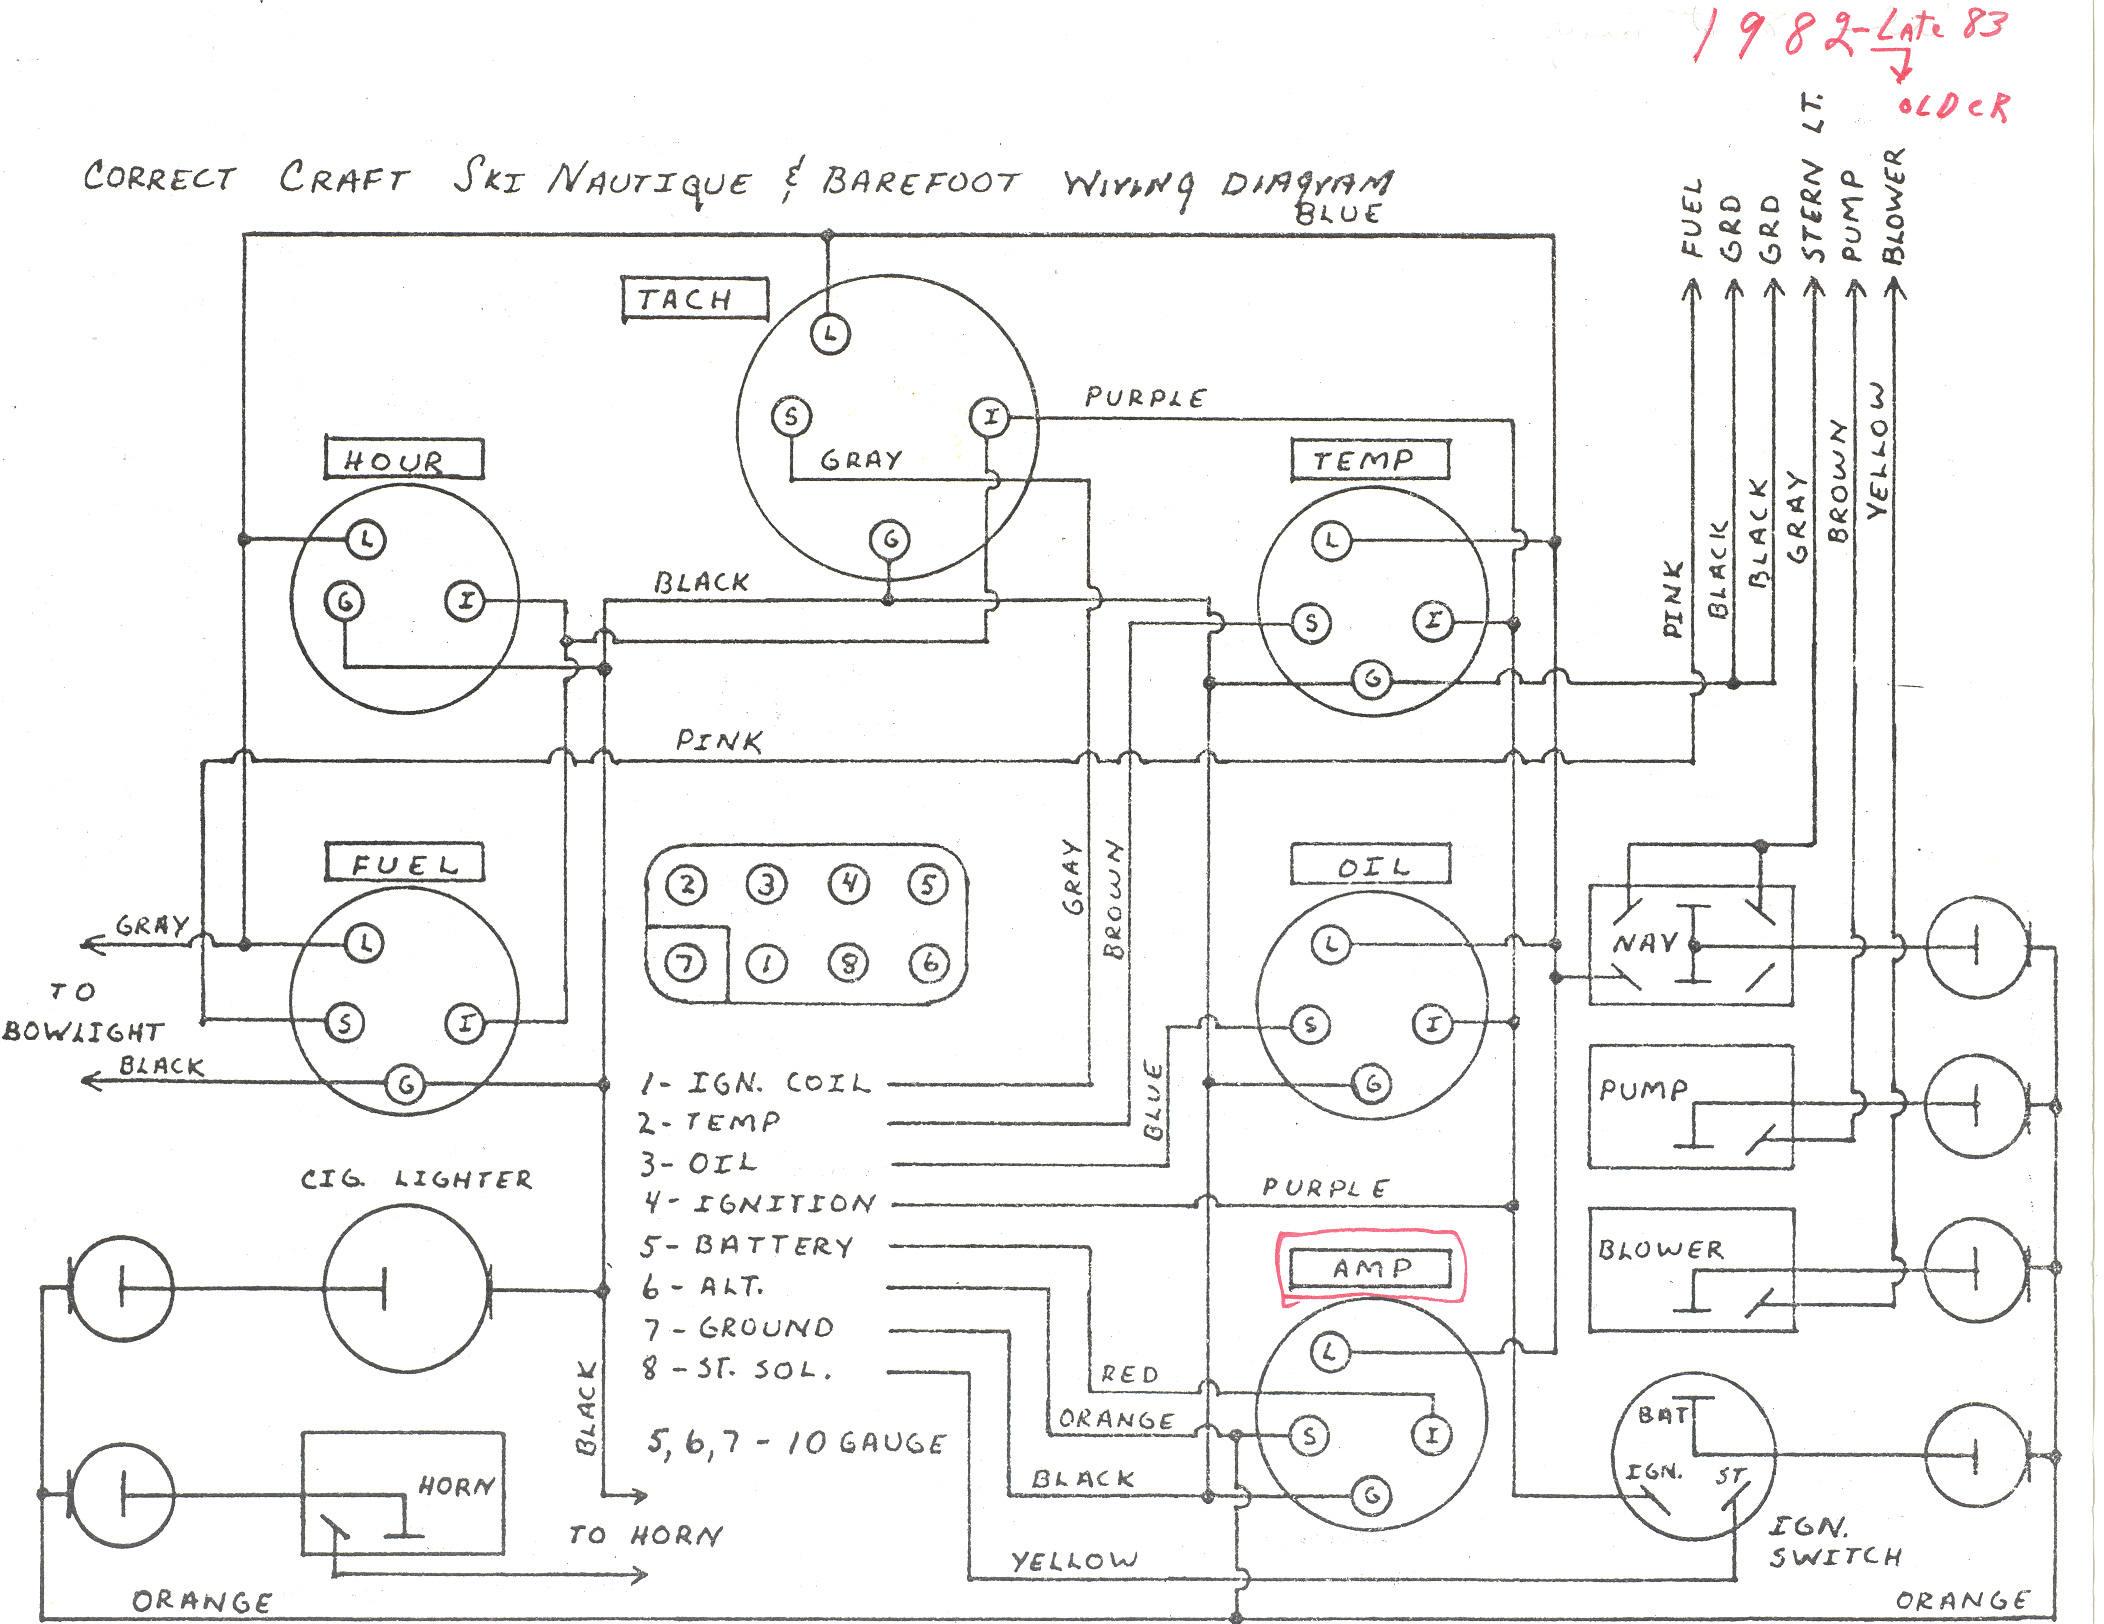 Sea Ray Sundancer 270 Bilge Pump Alarm Wiring Diagram